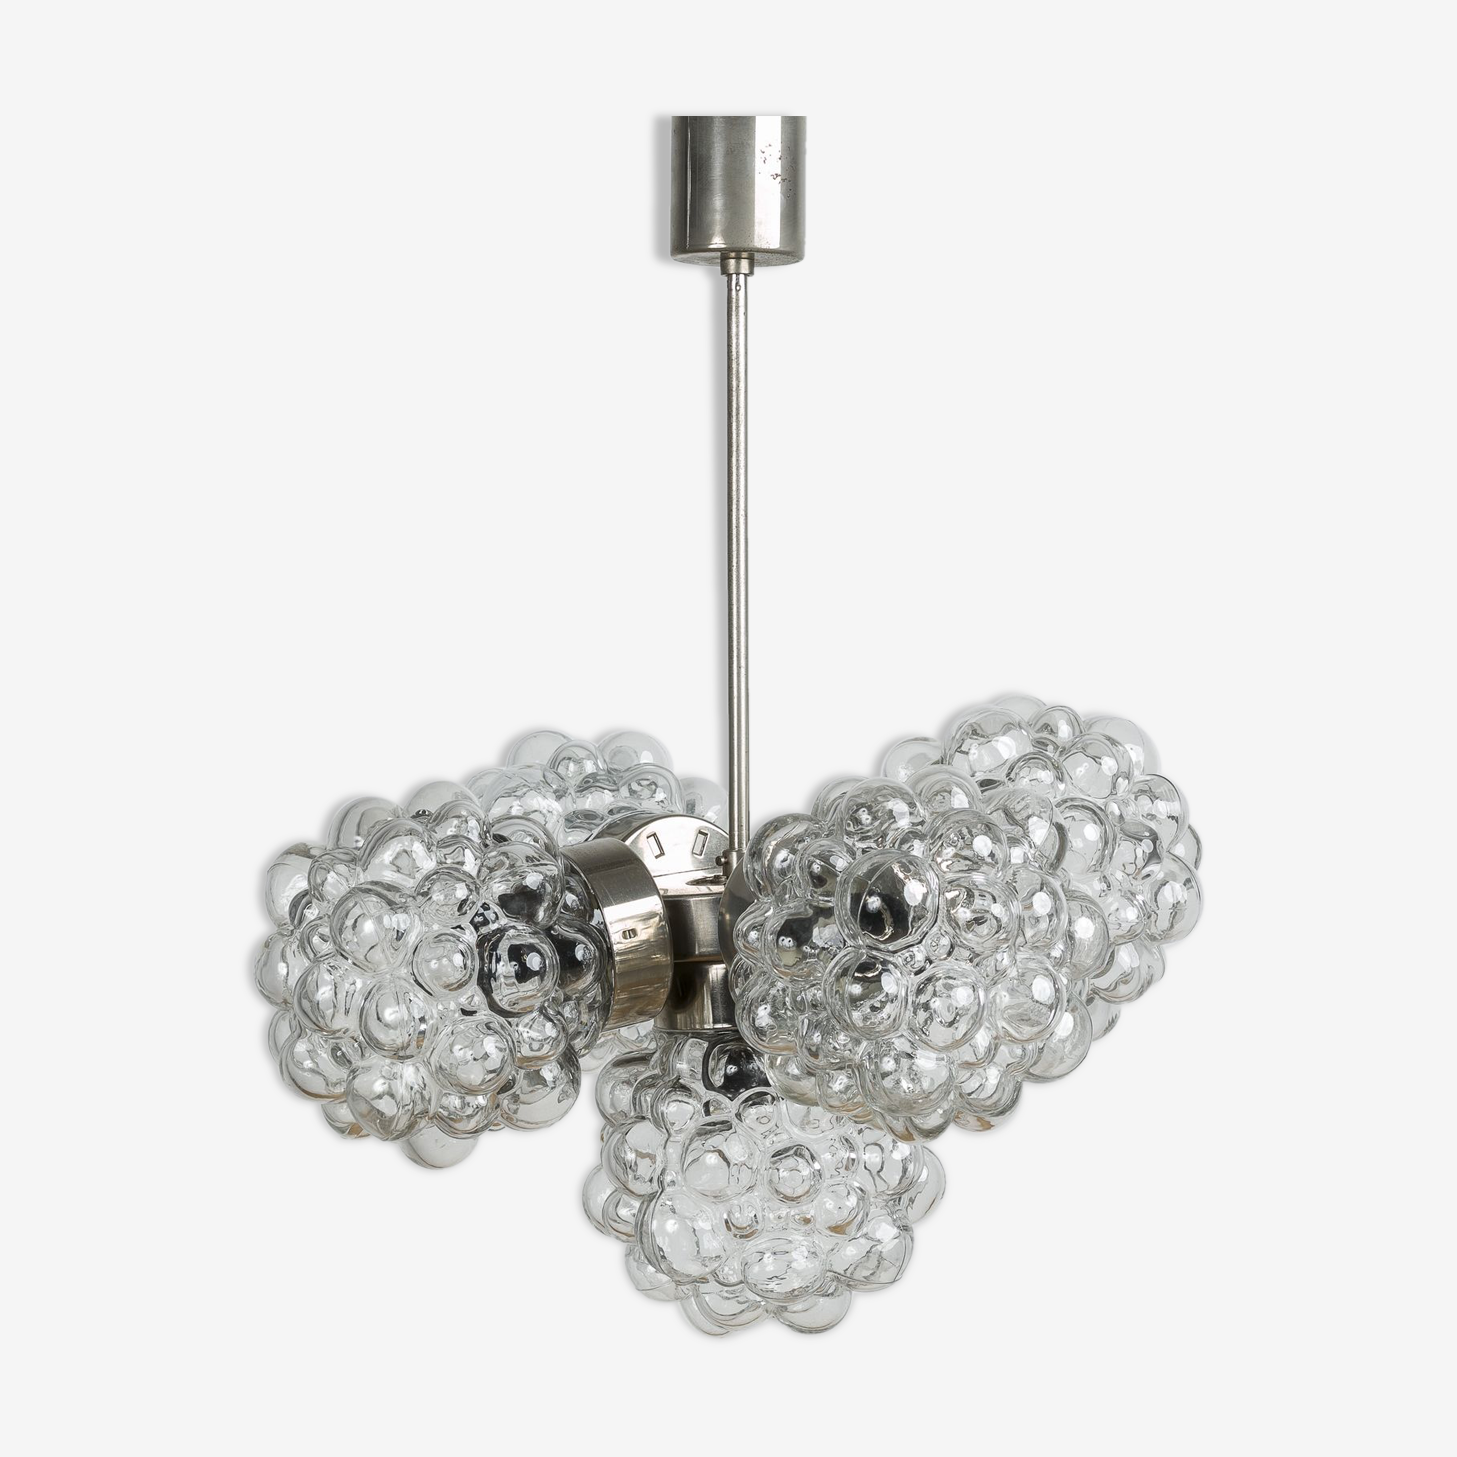 Bubble glass chandelier, 70's